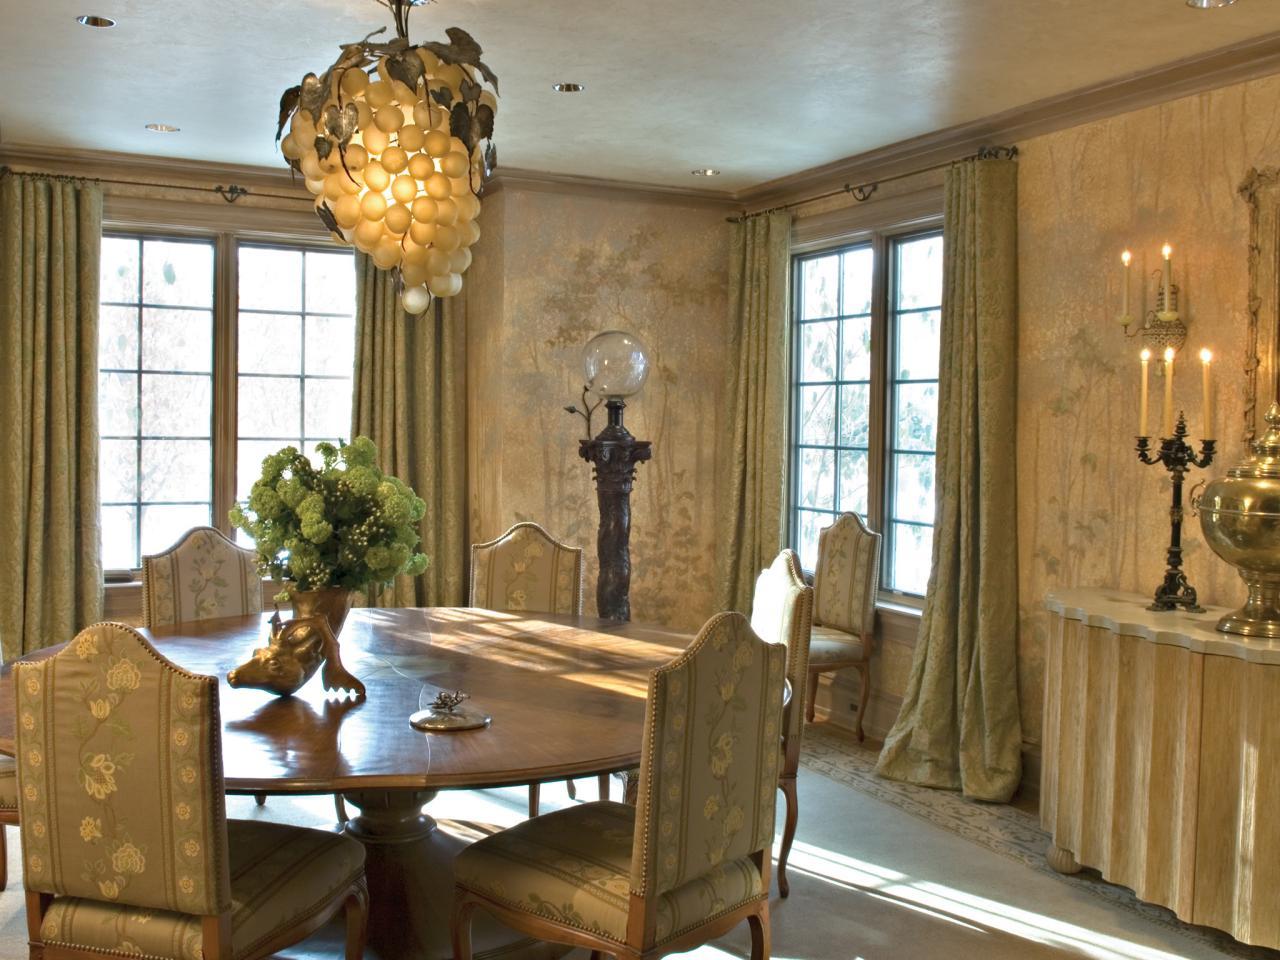 Elegant Dining Room With Grape Chandelier